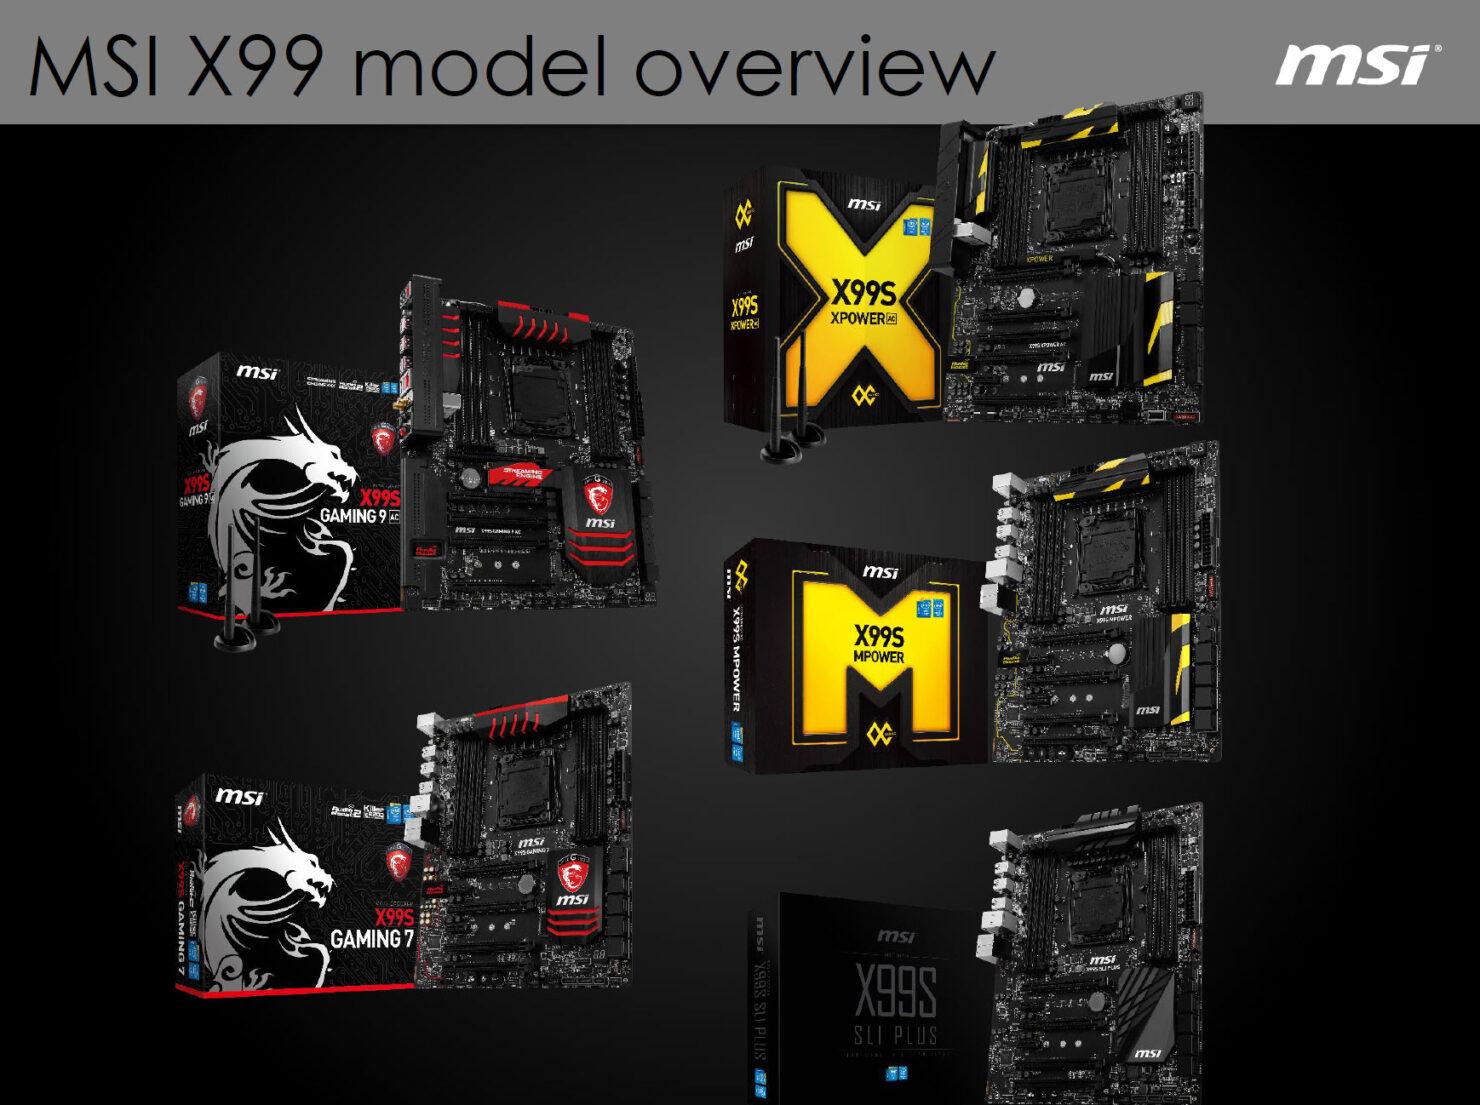 msi-x99-motherboard-press-slides_4